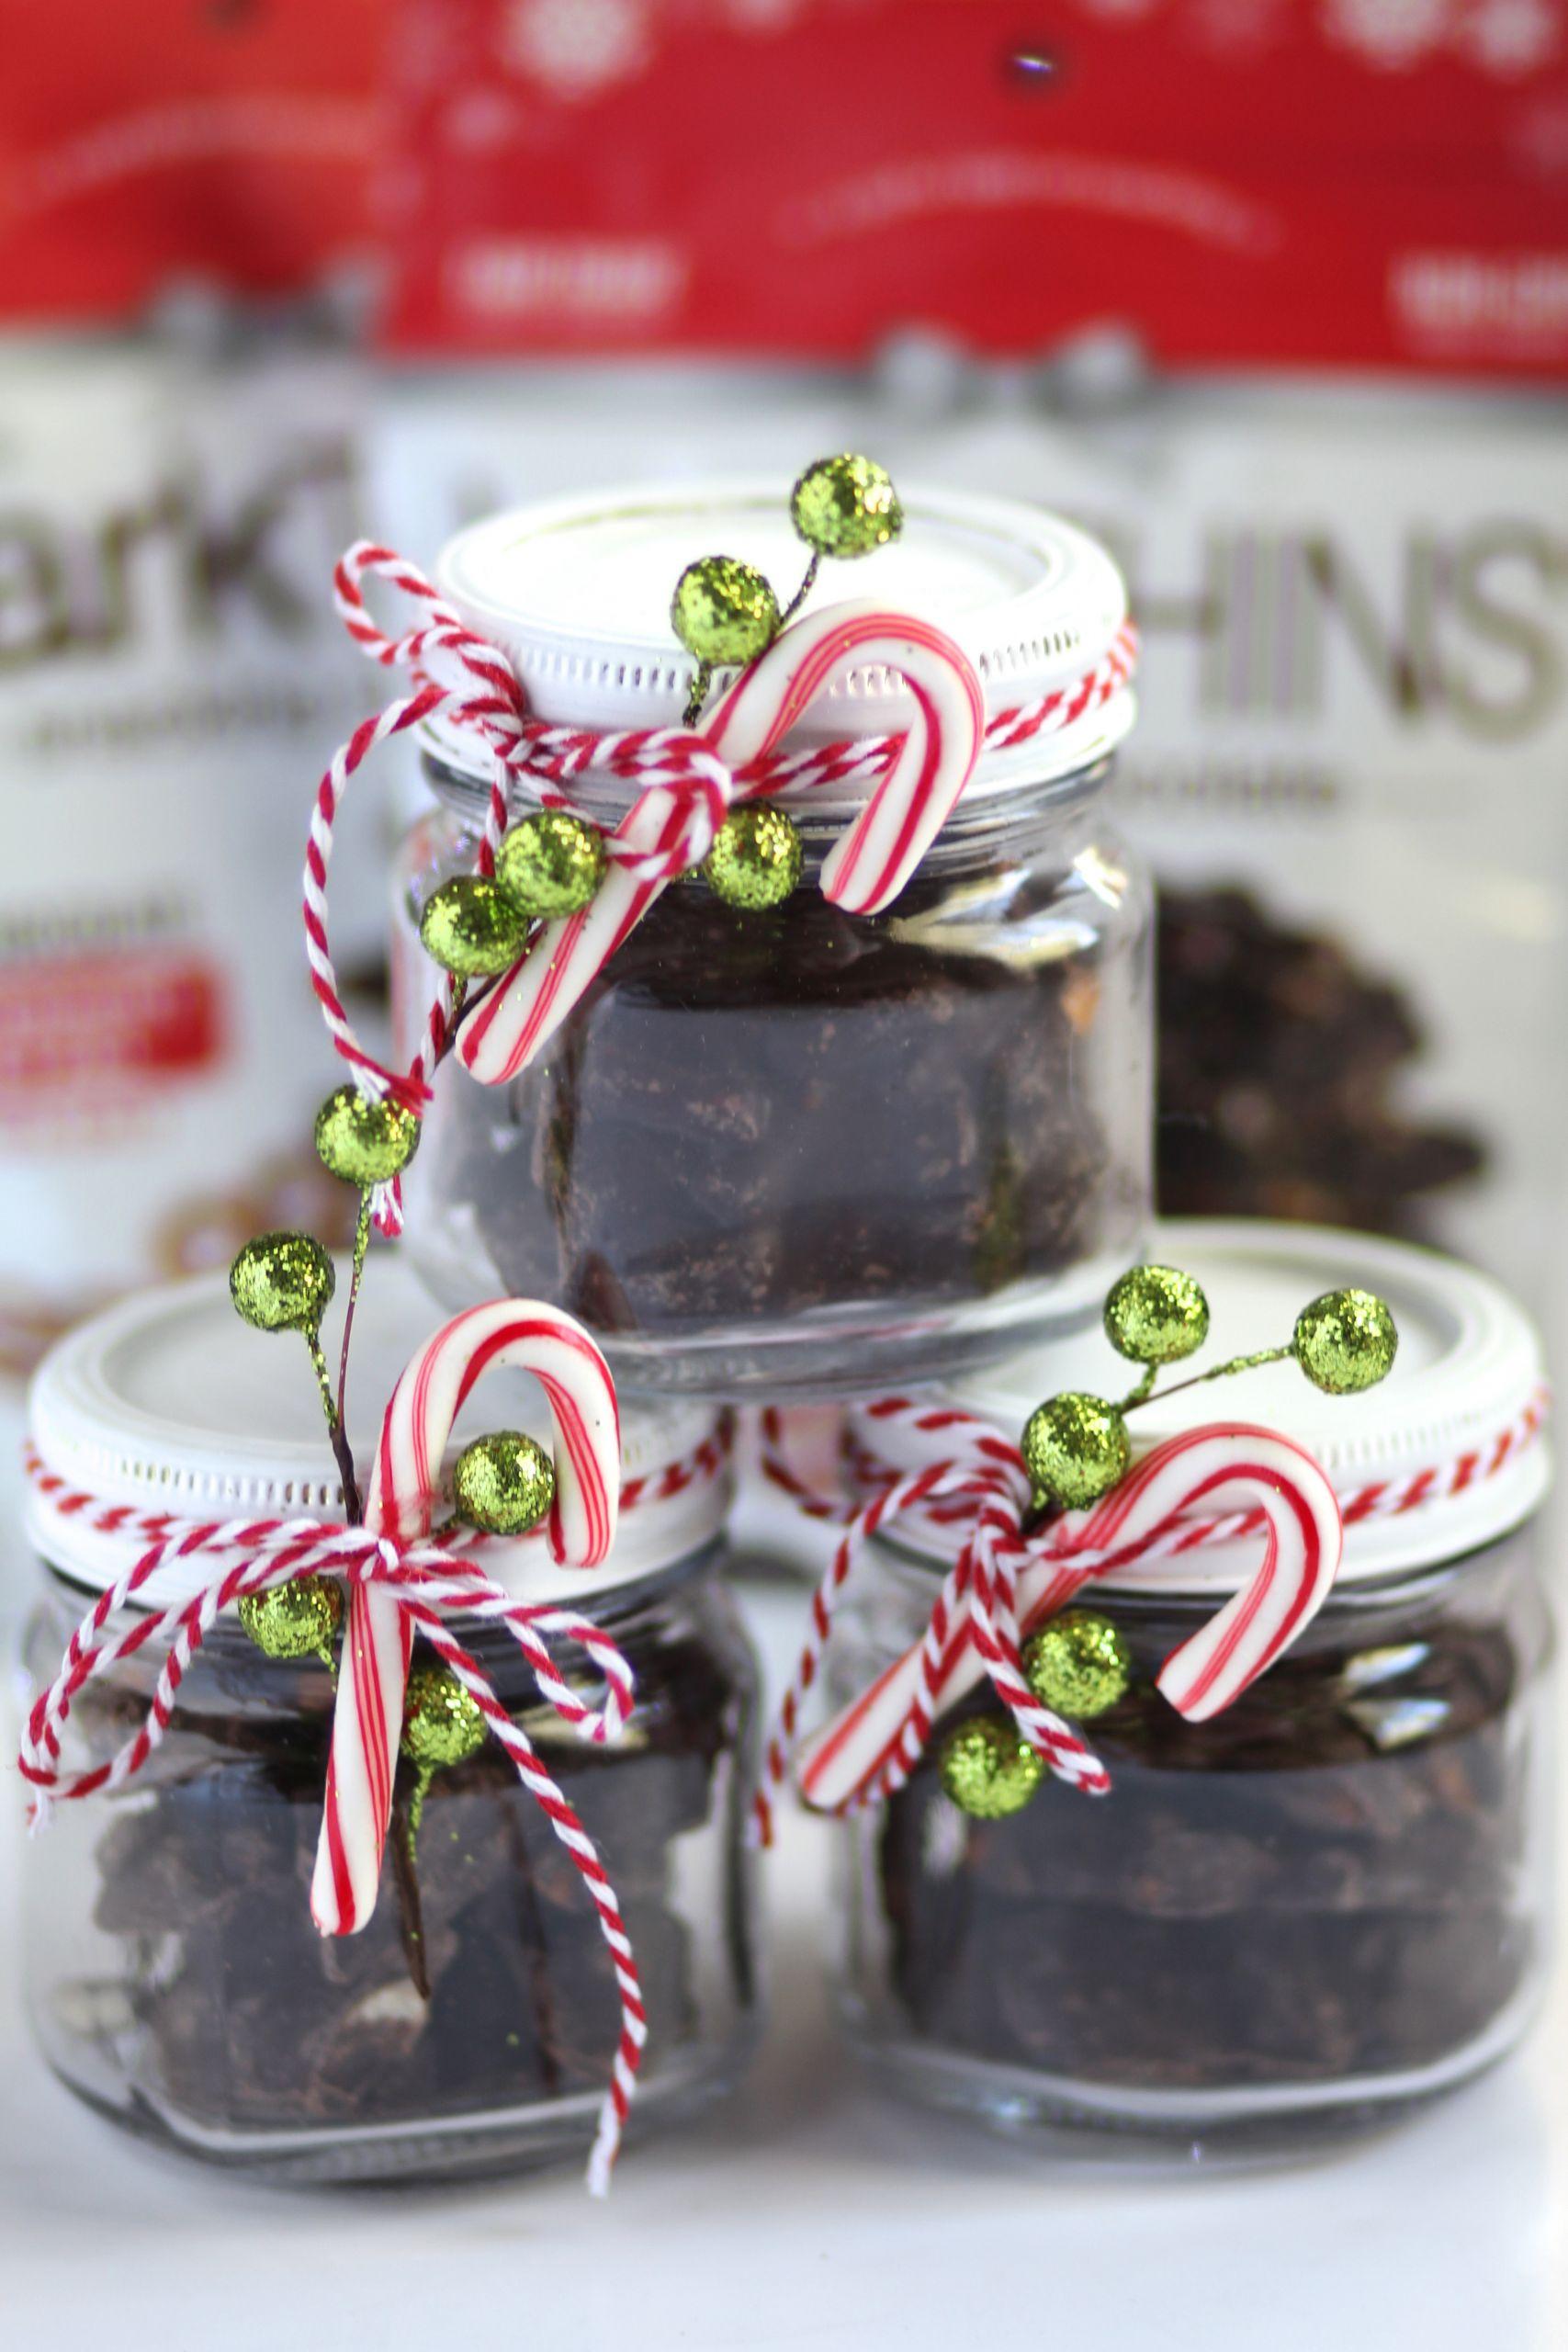 DIY Holiday Gift Ideas  10 minute DIY Christmas Gift Idea